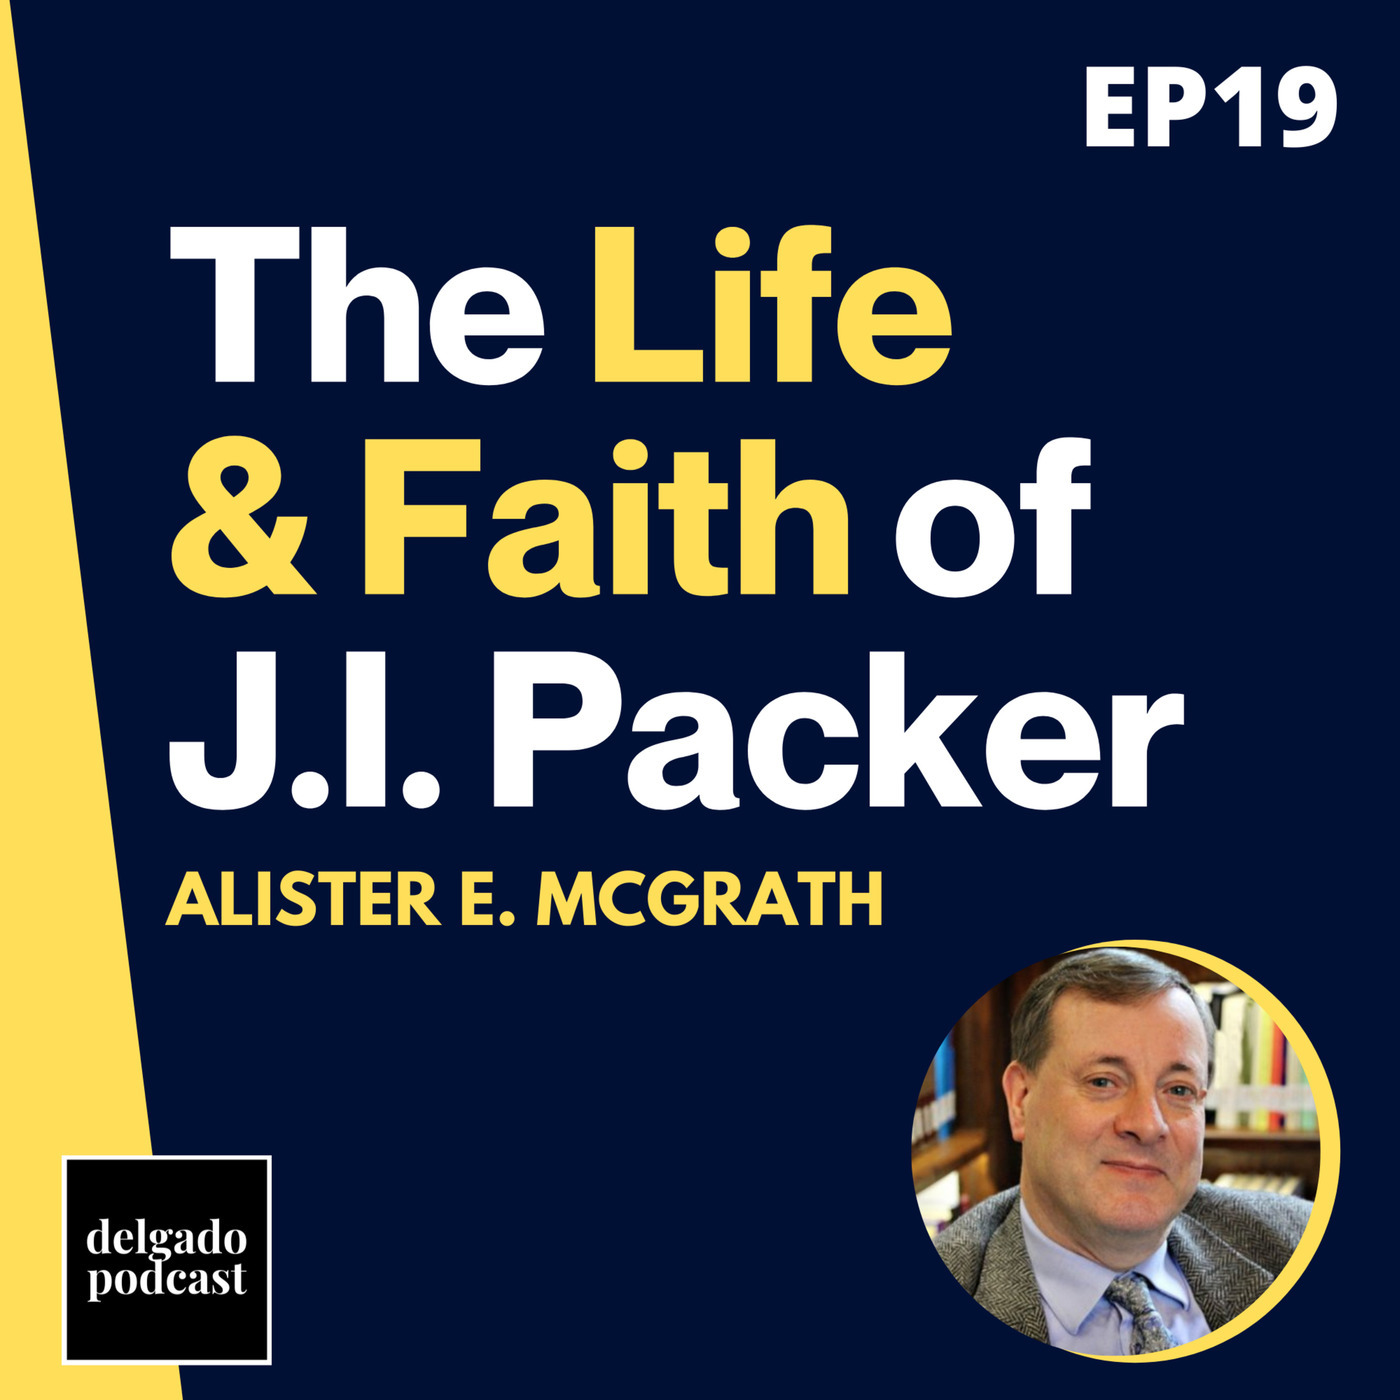 Delgado Podcast mcgrath: The Life, Theology & Faith of J.I. Packer - Dr. Alister E. McGrath